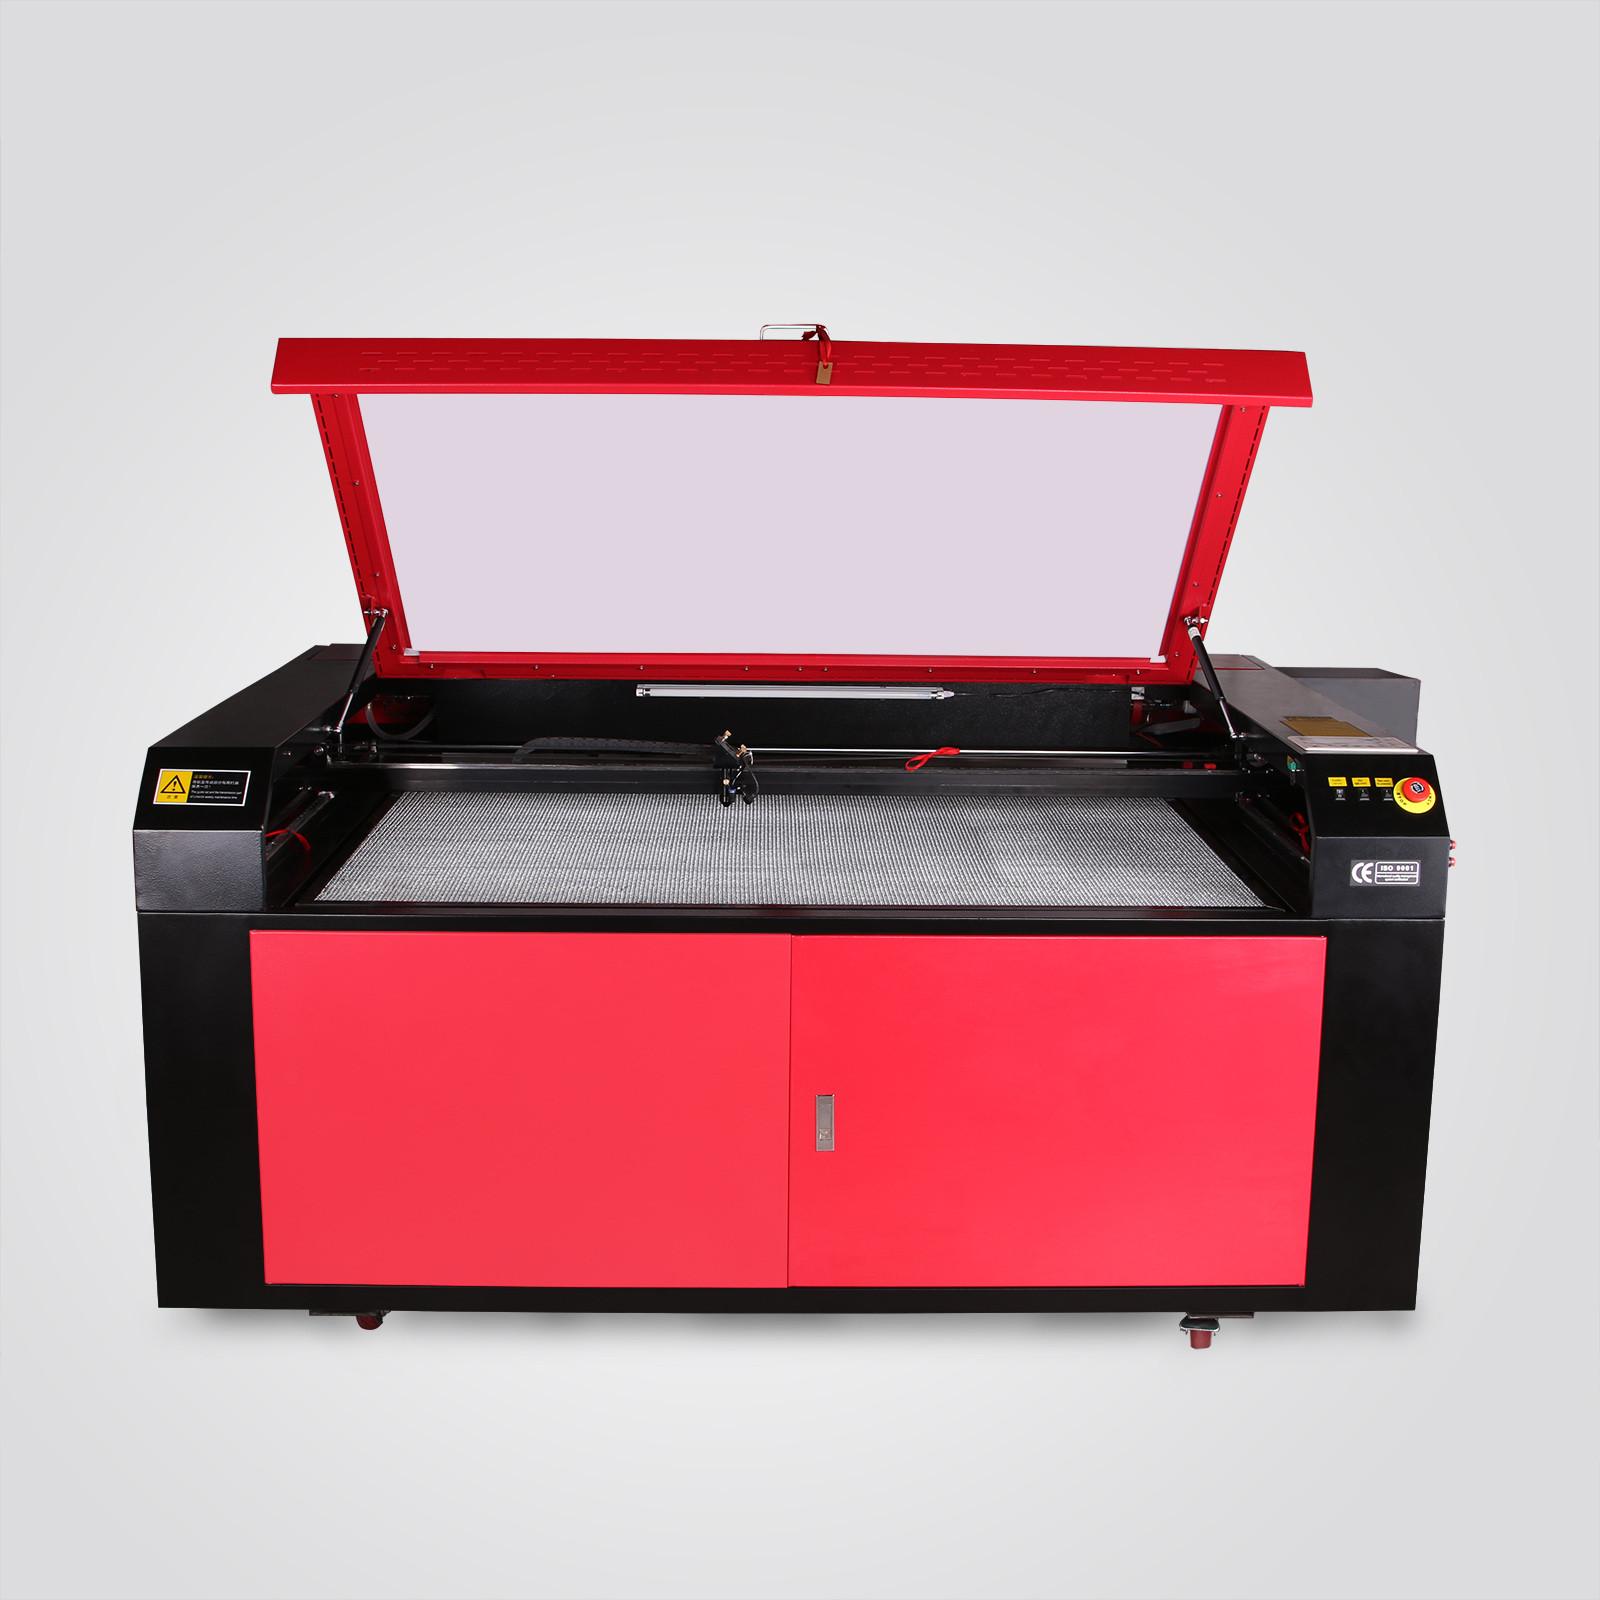 Macchina-per-Incisione-Laser-CO2-40-130W-Asse-Rotante-Tagliatrice-Incisore miniatura 66